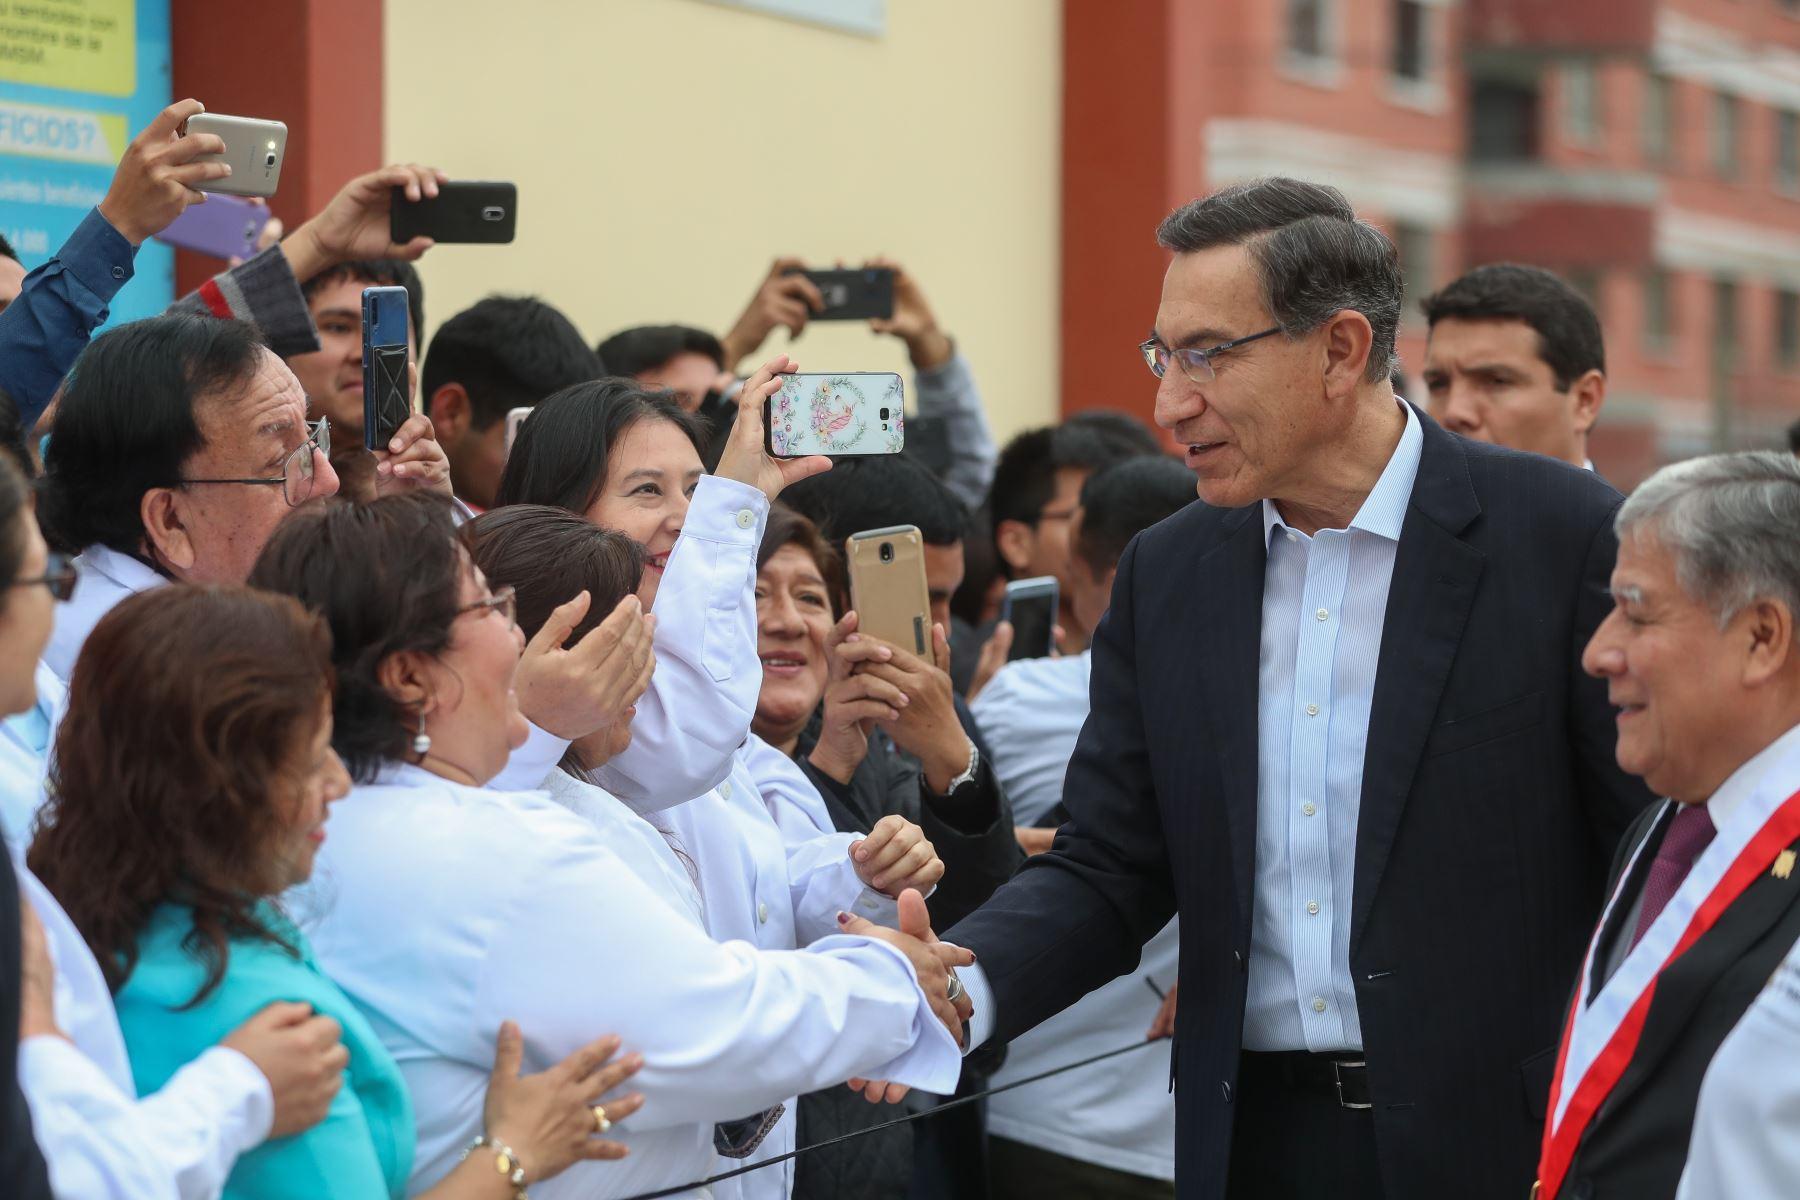 Presidente Vizcarra participa en inauguración de centro de salud mental universitario. Foto: ANDINA/Prensa Presidencia